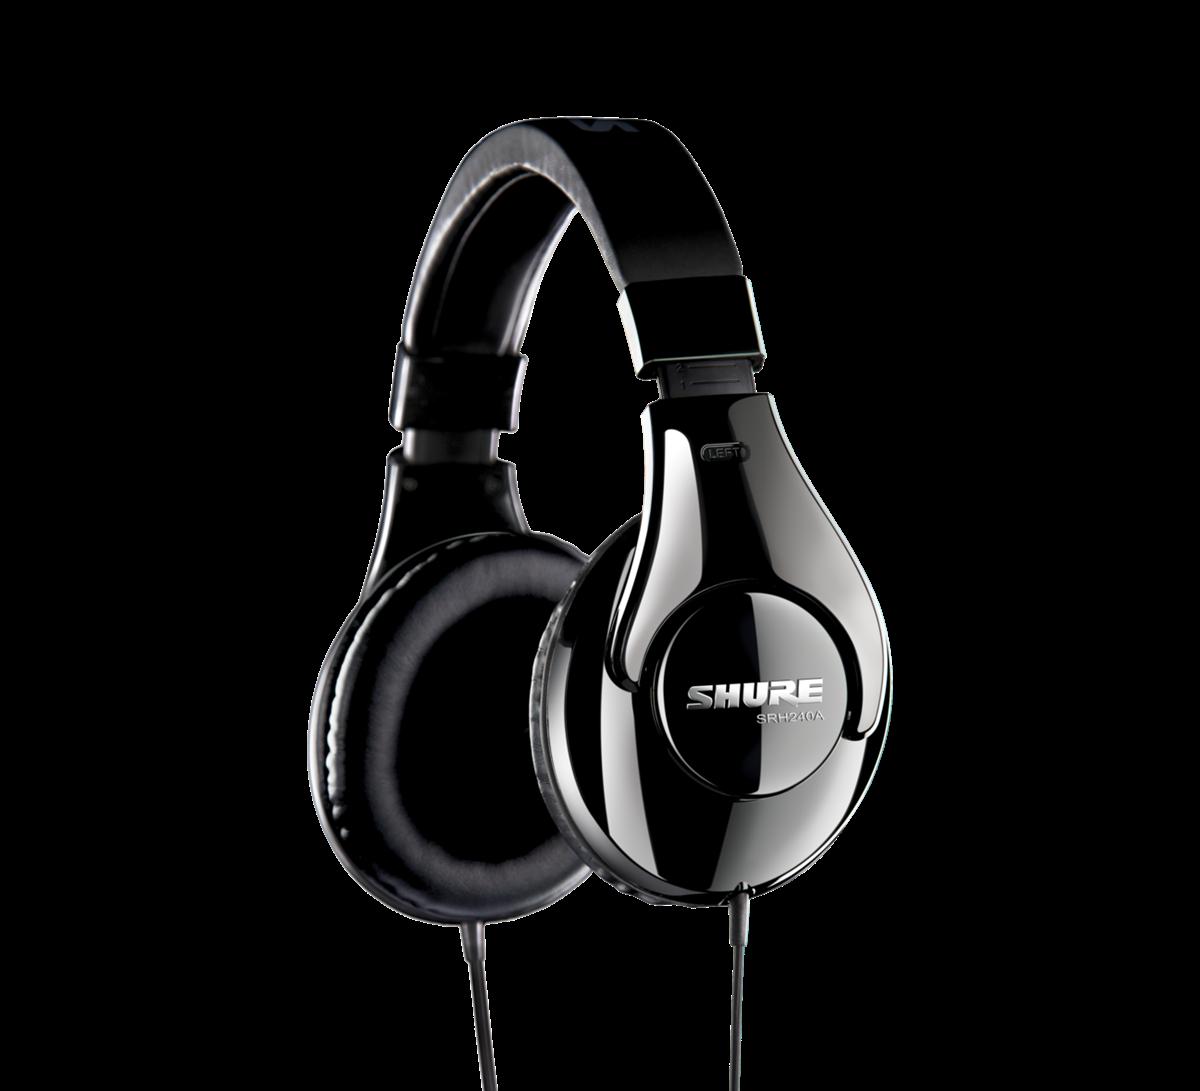 Shure SRH240A-E headphones